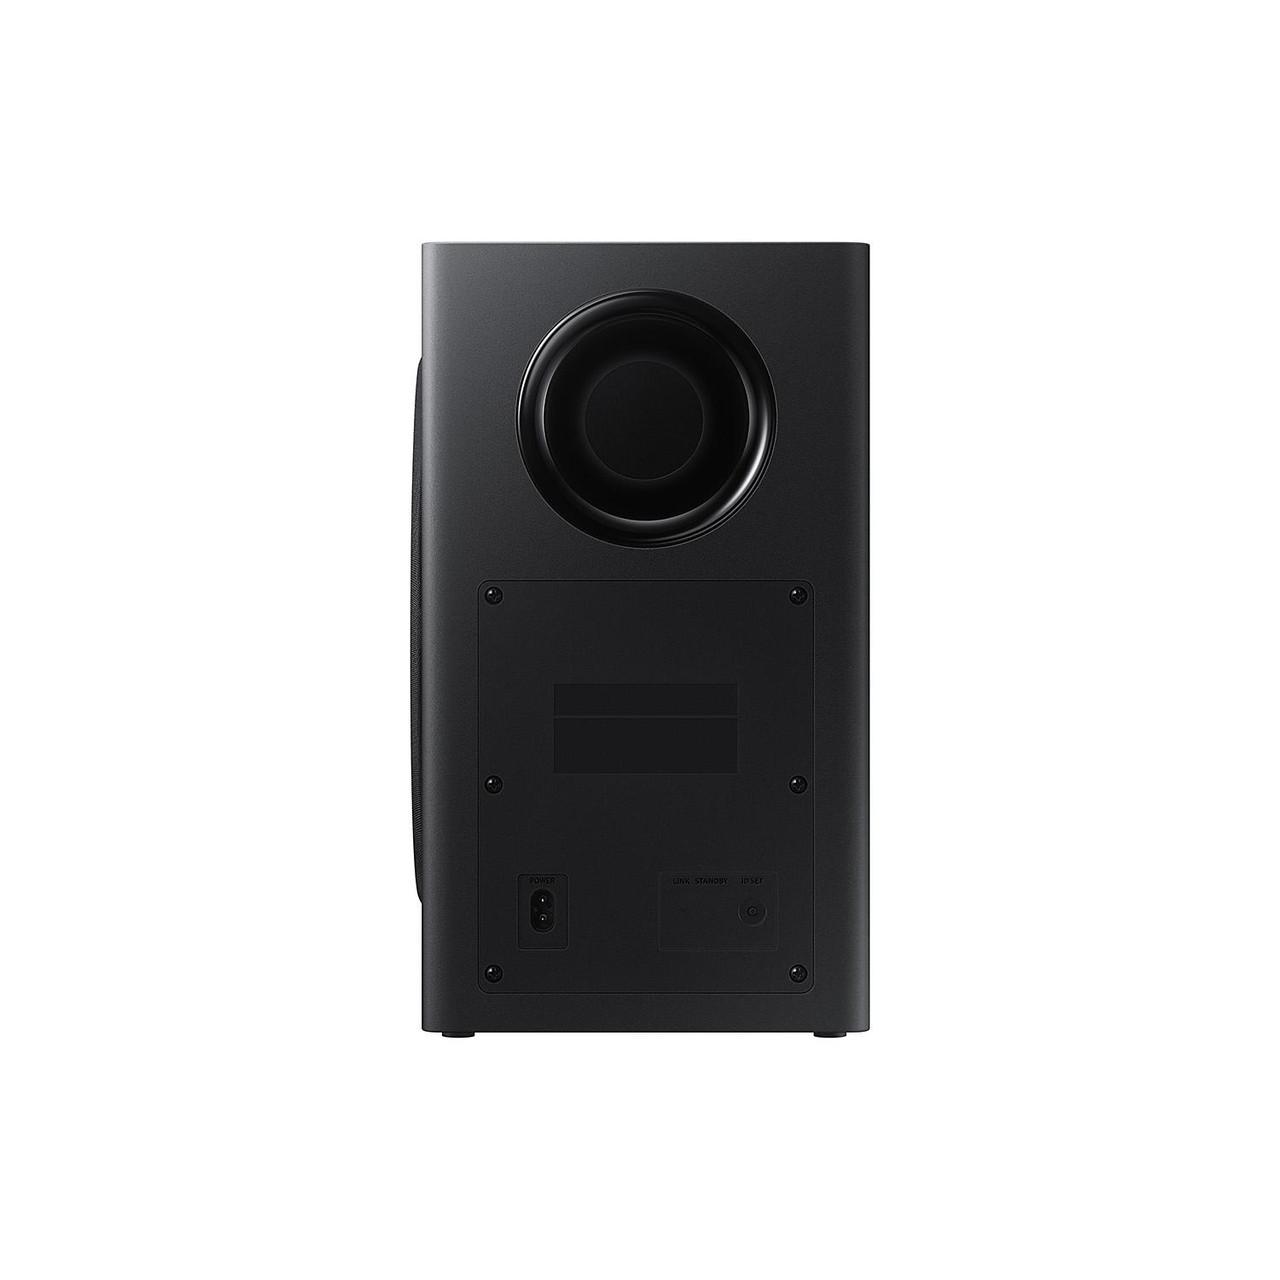 Samsung HW-R60C/ZAR 3.1ch Soundbar Wireless Subwoofer System - Certified Refurbished